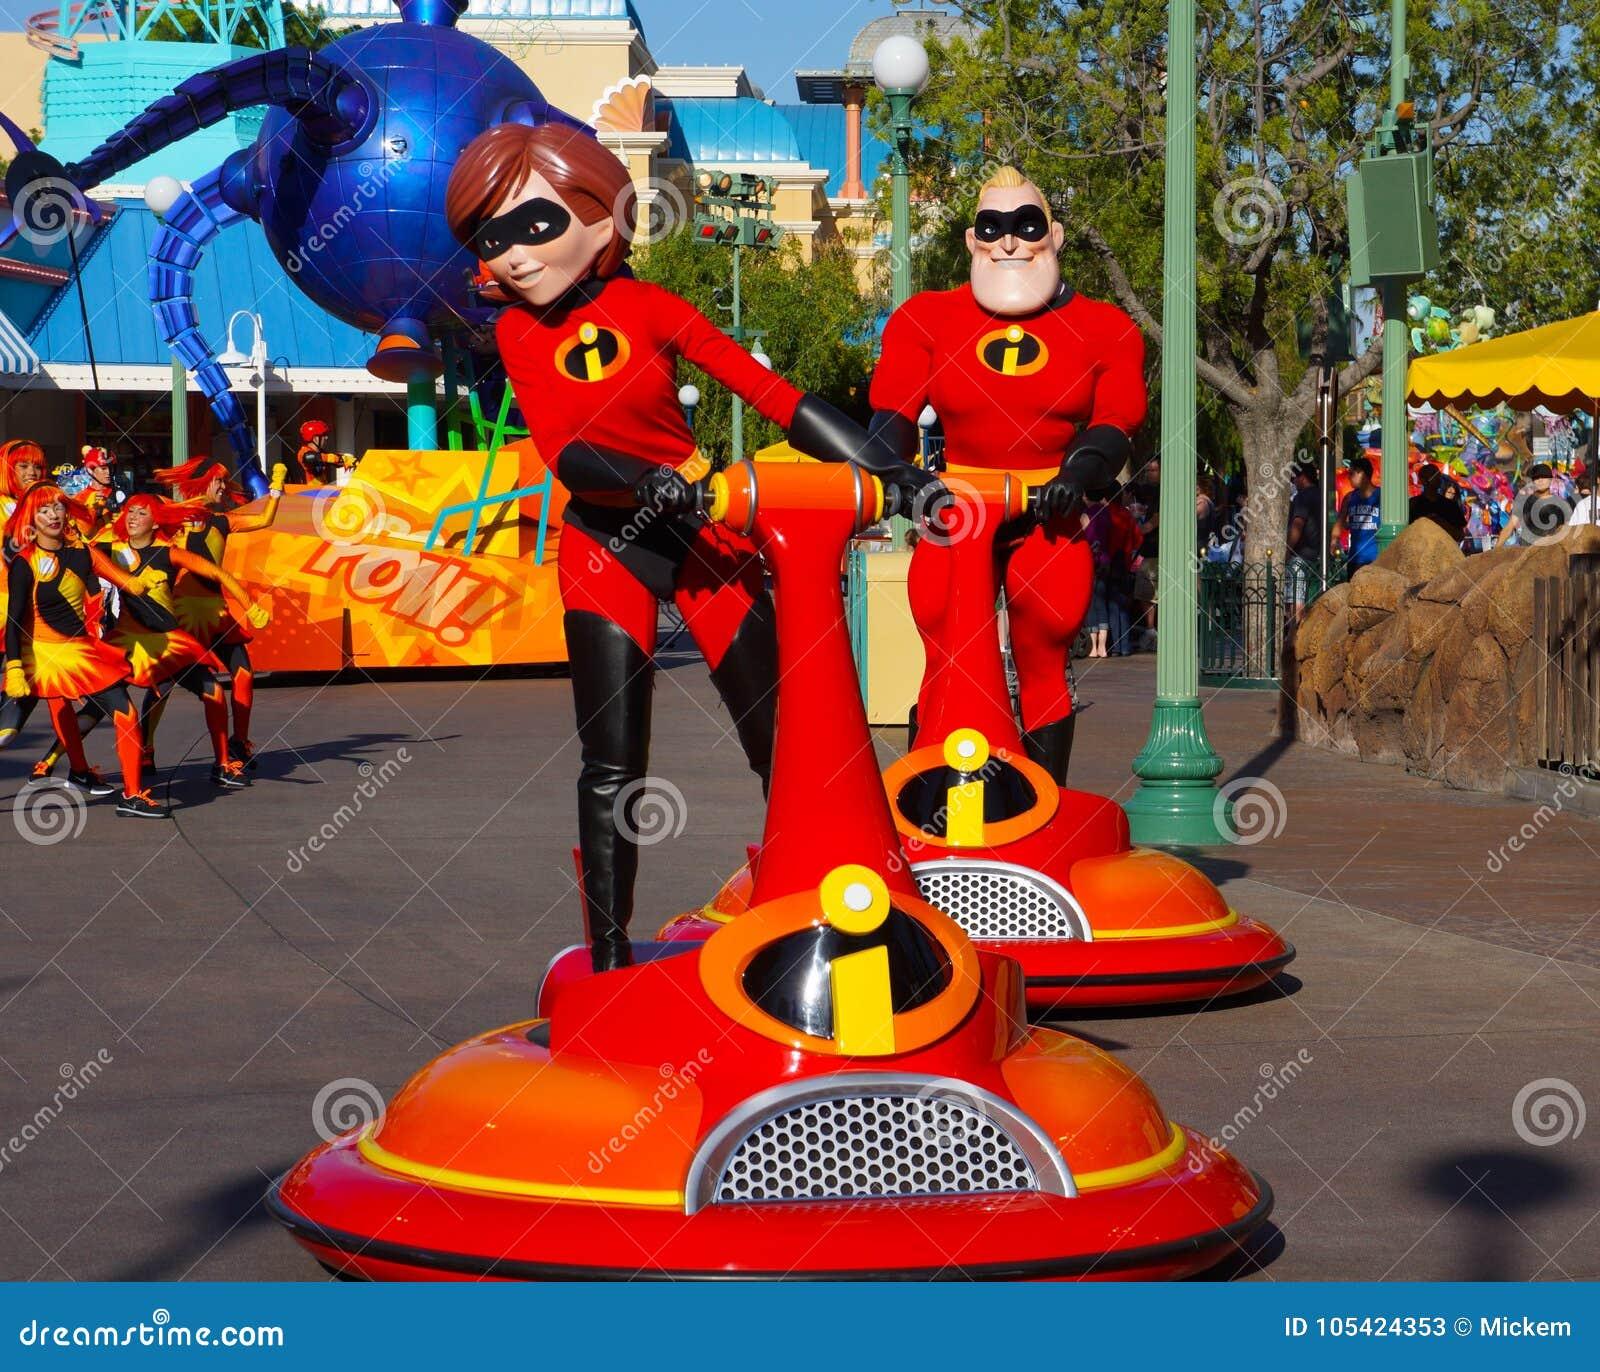 Parade Disneylands Pixar das Incredibles